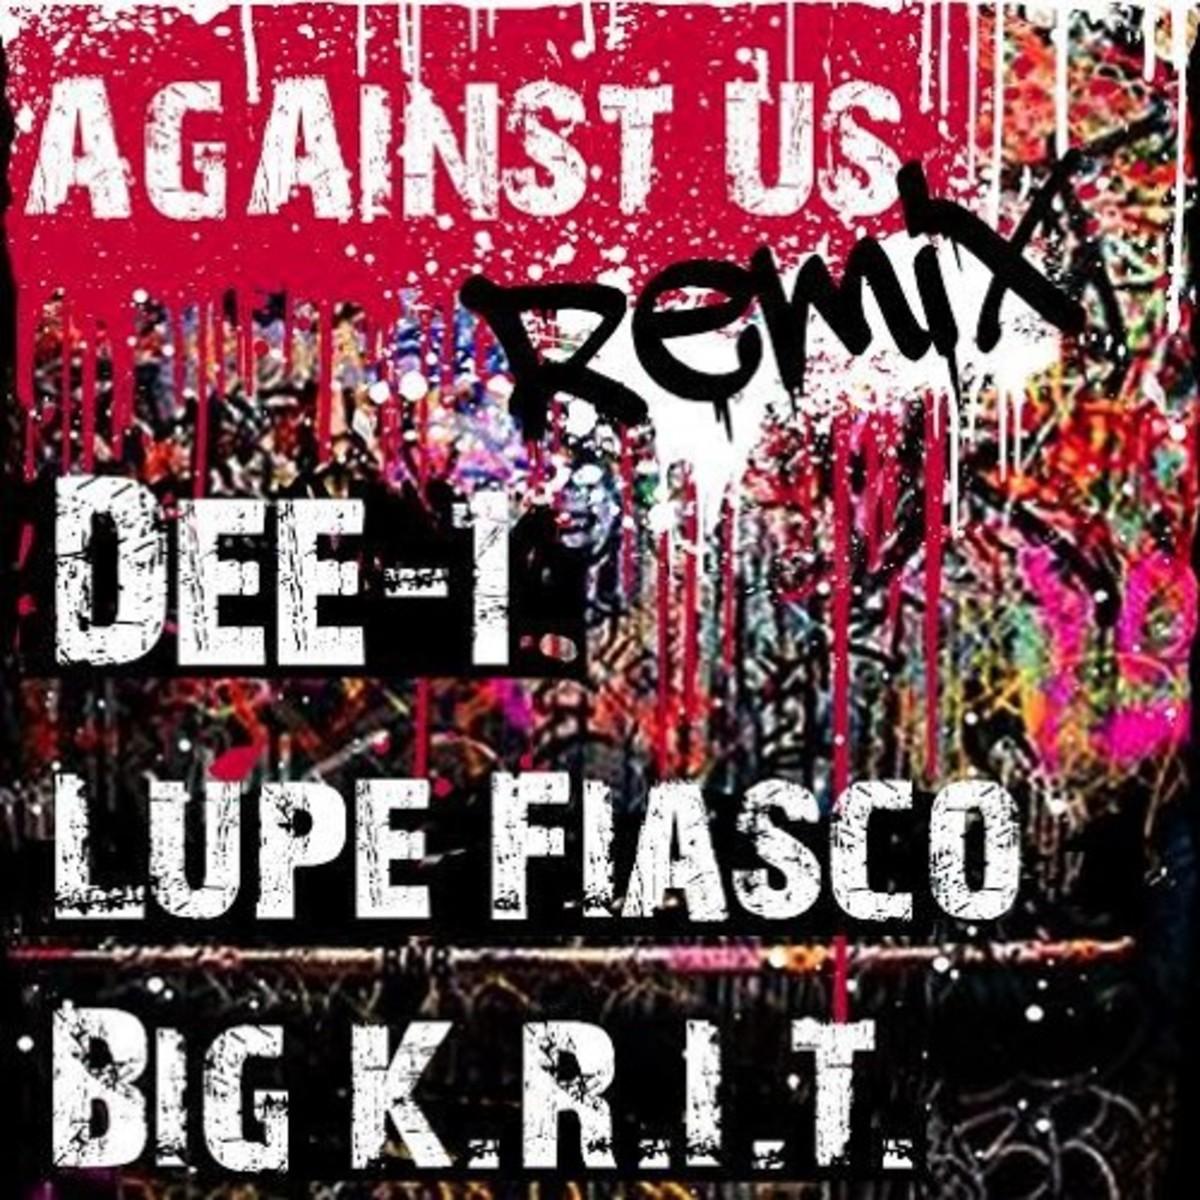 dee-1-against-us-remix.jpg